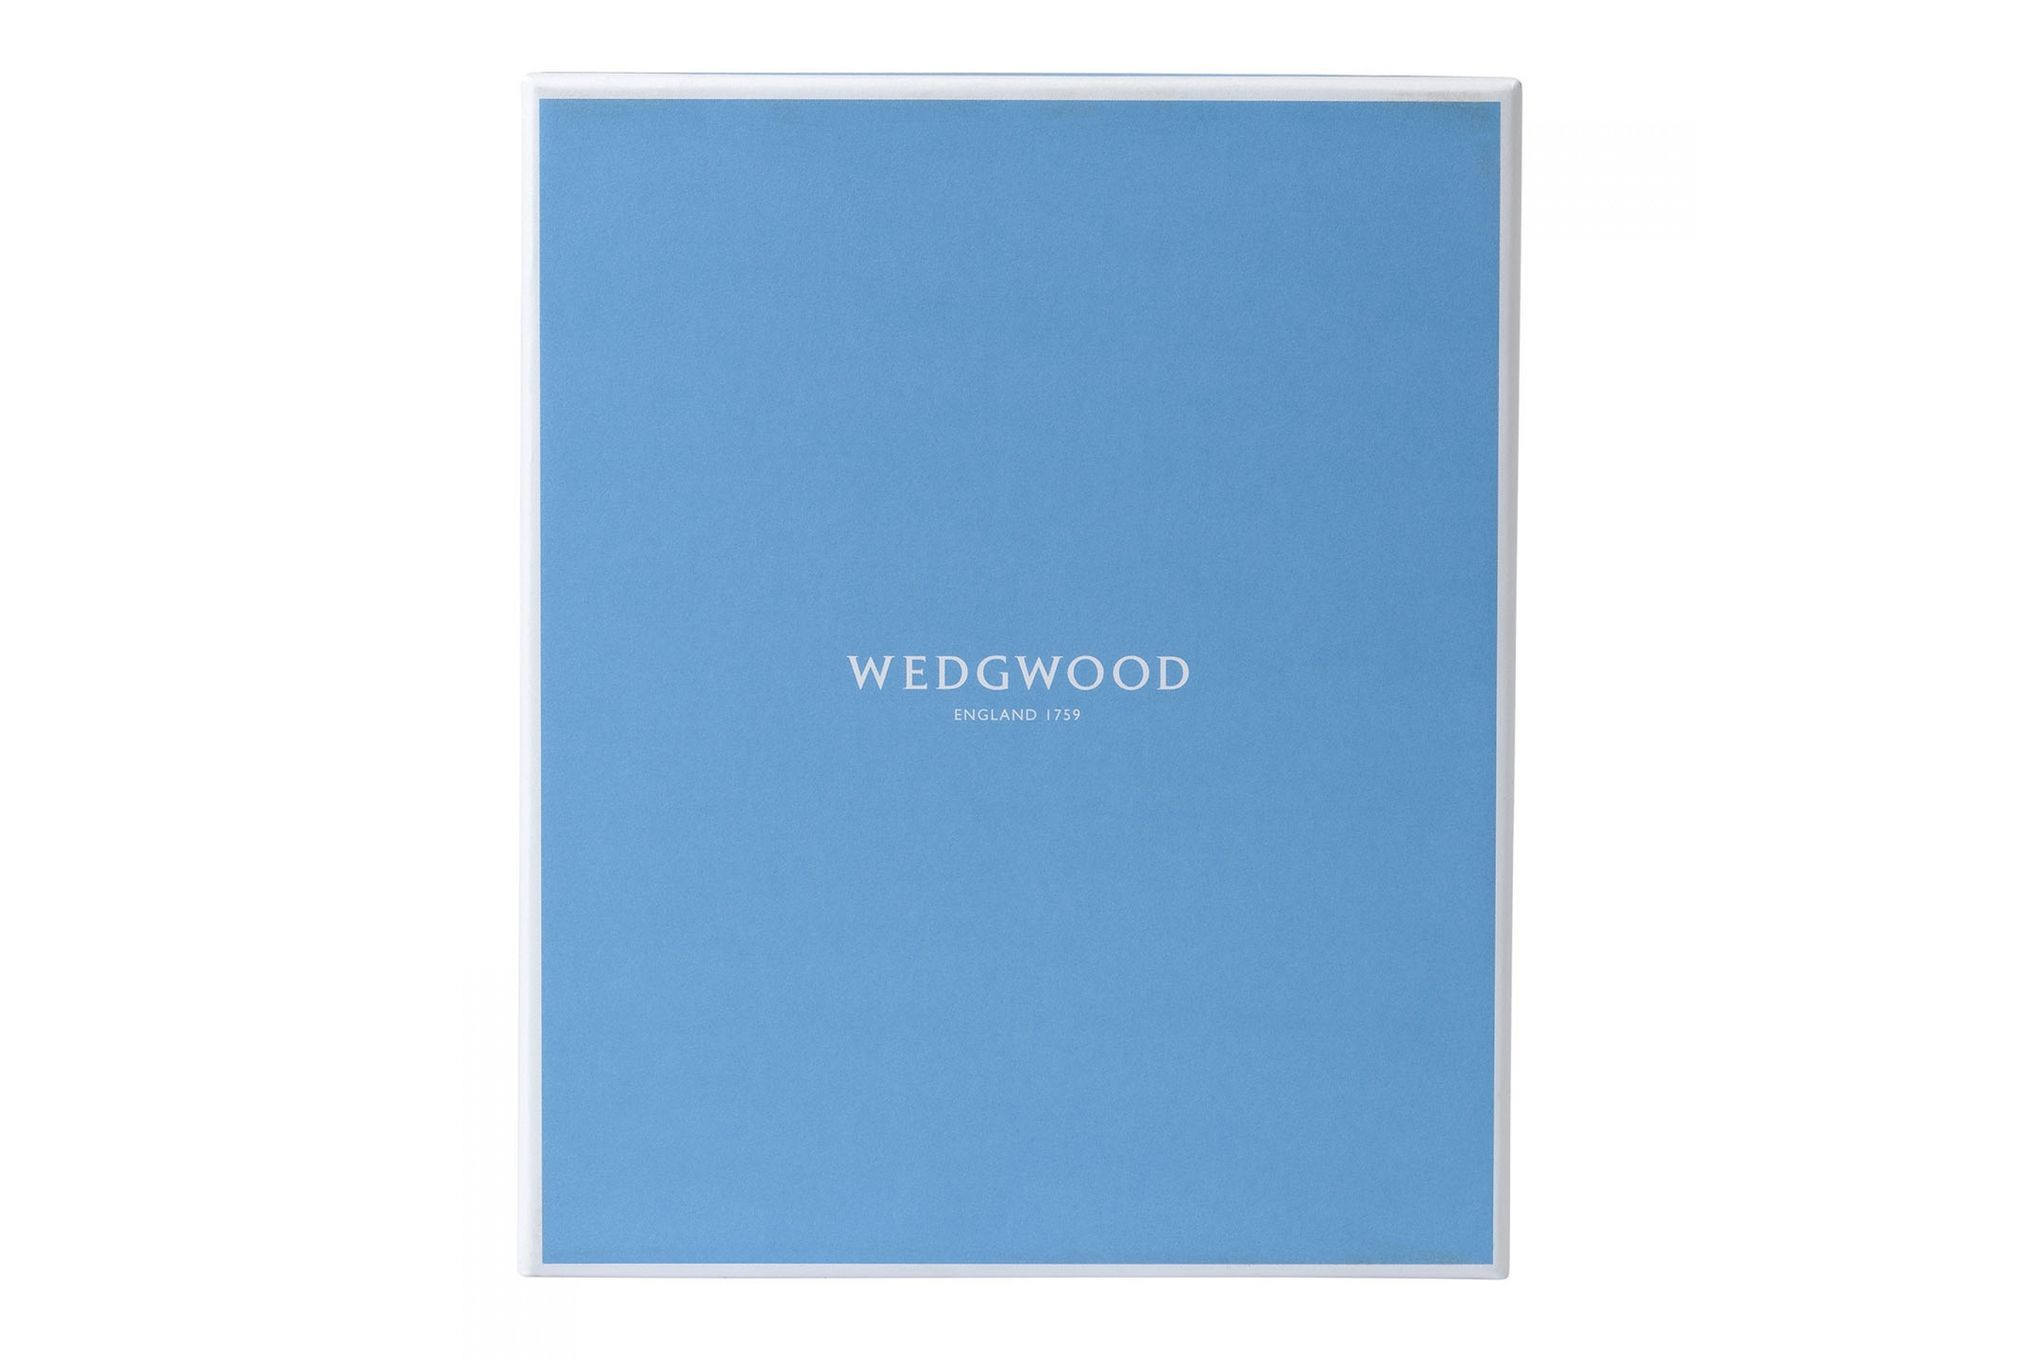 "Wedgwood Wonderlust Photo Frame Rococo Flowers - Boxed 4 x 6"" thumb 2"